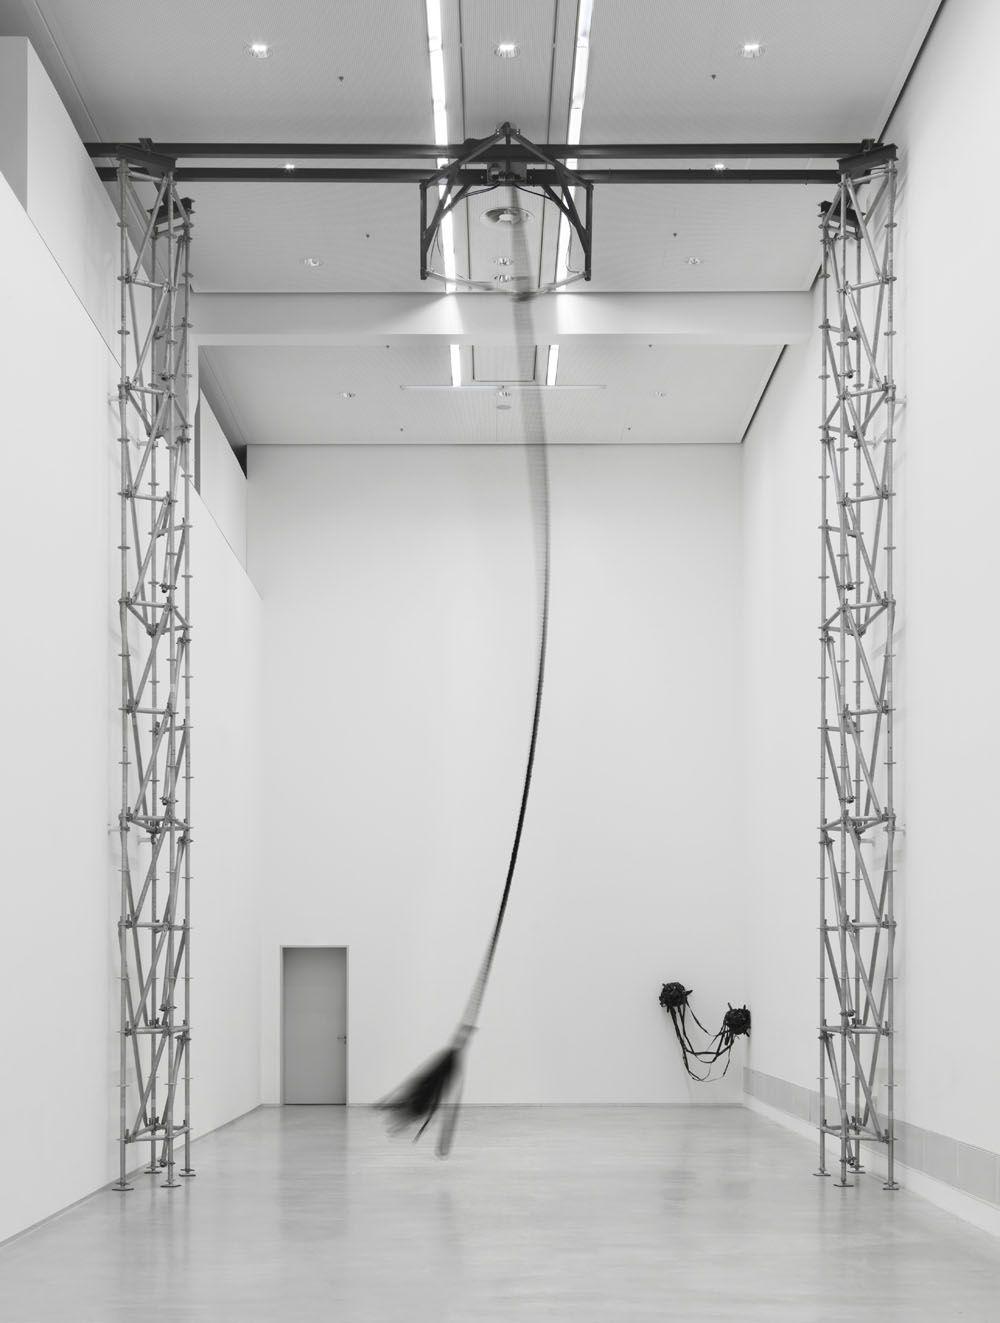 Monica Bonvicini at Berlinische Galerie Museum of Modern Art